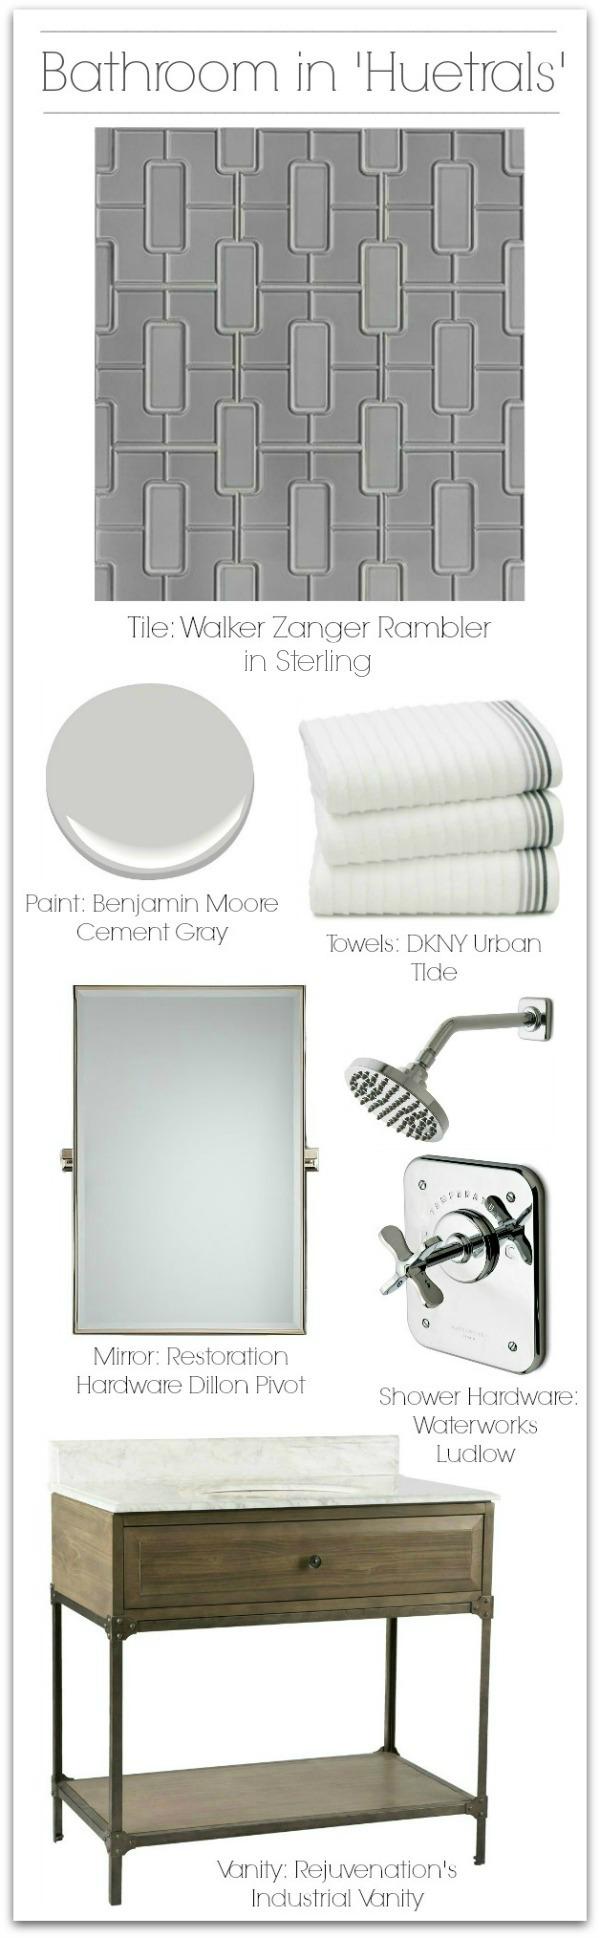 Bathroom design ideas using 'huetrals' in shades of gray